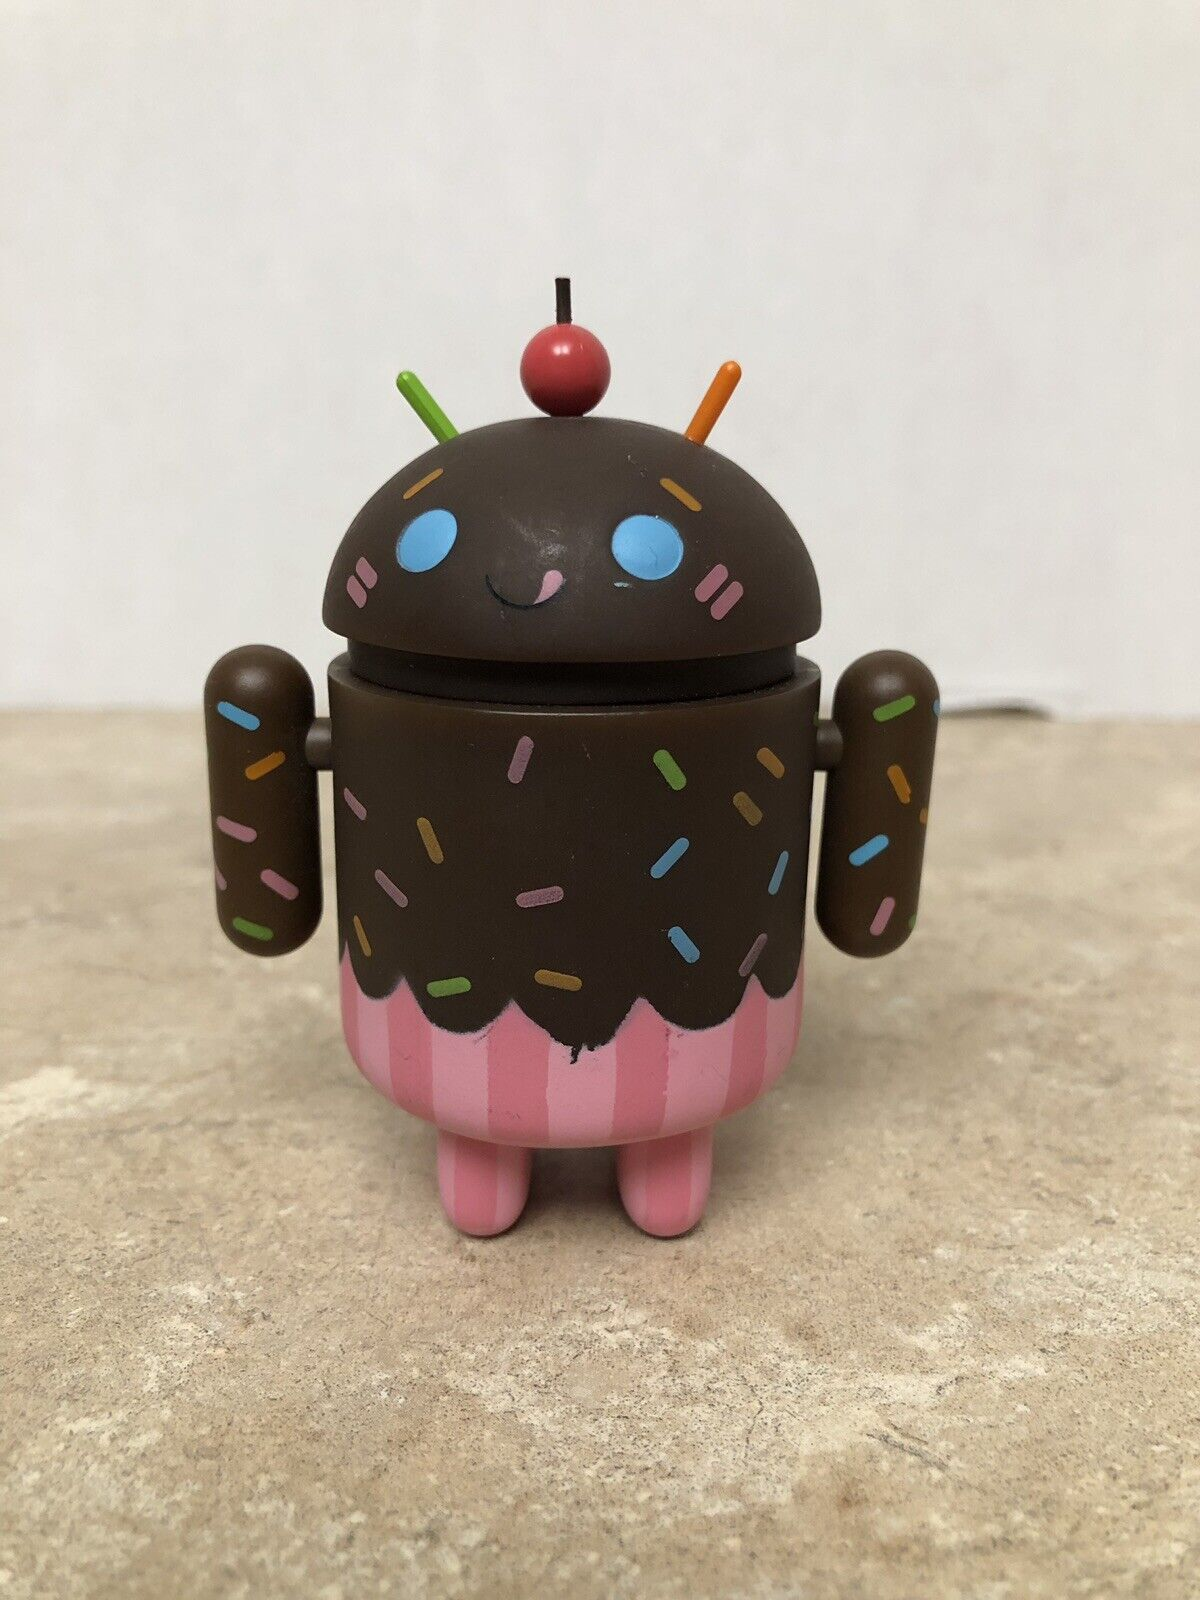 ULTRA RARE CHASE Google Android Mini Figure Series 2 Chocolate Cupcake Gary Ham